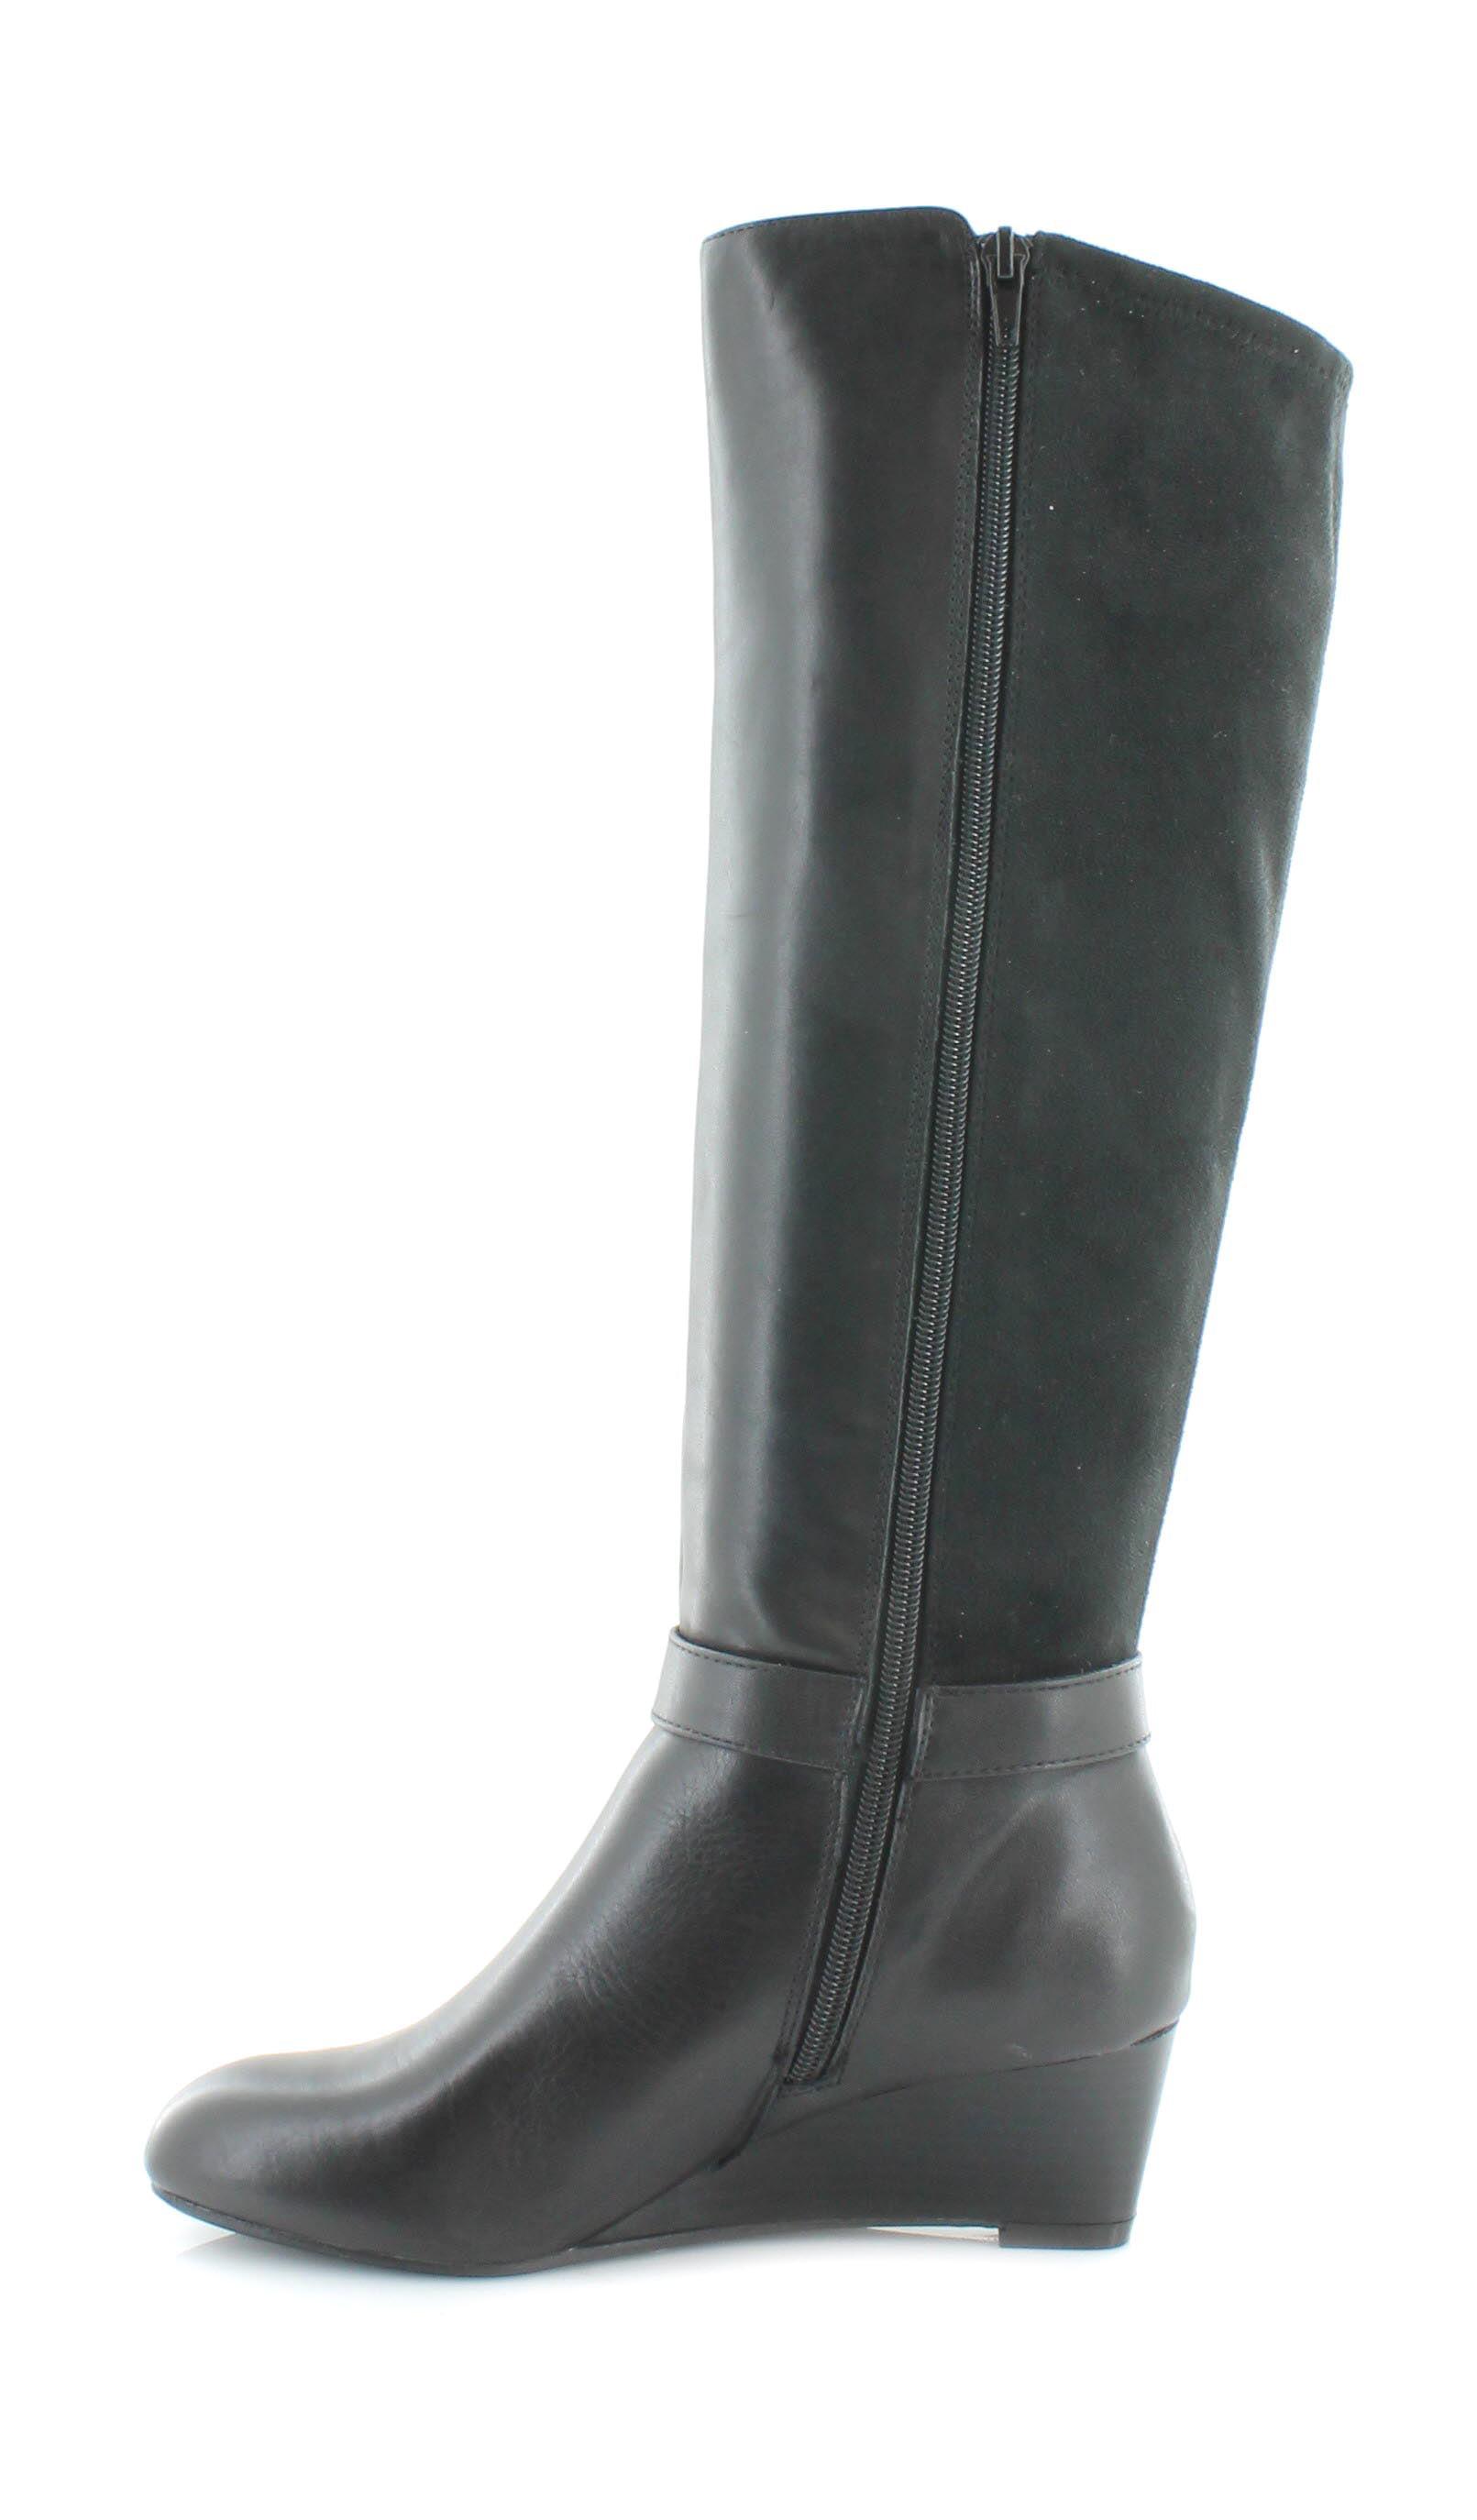 Giani Bernini Dafnee Wide Calf  Round Toe Boots